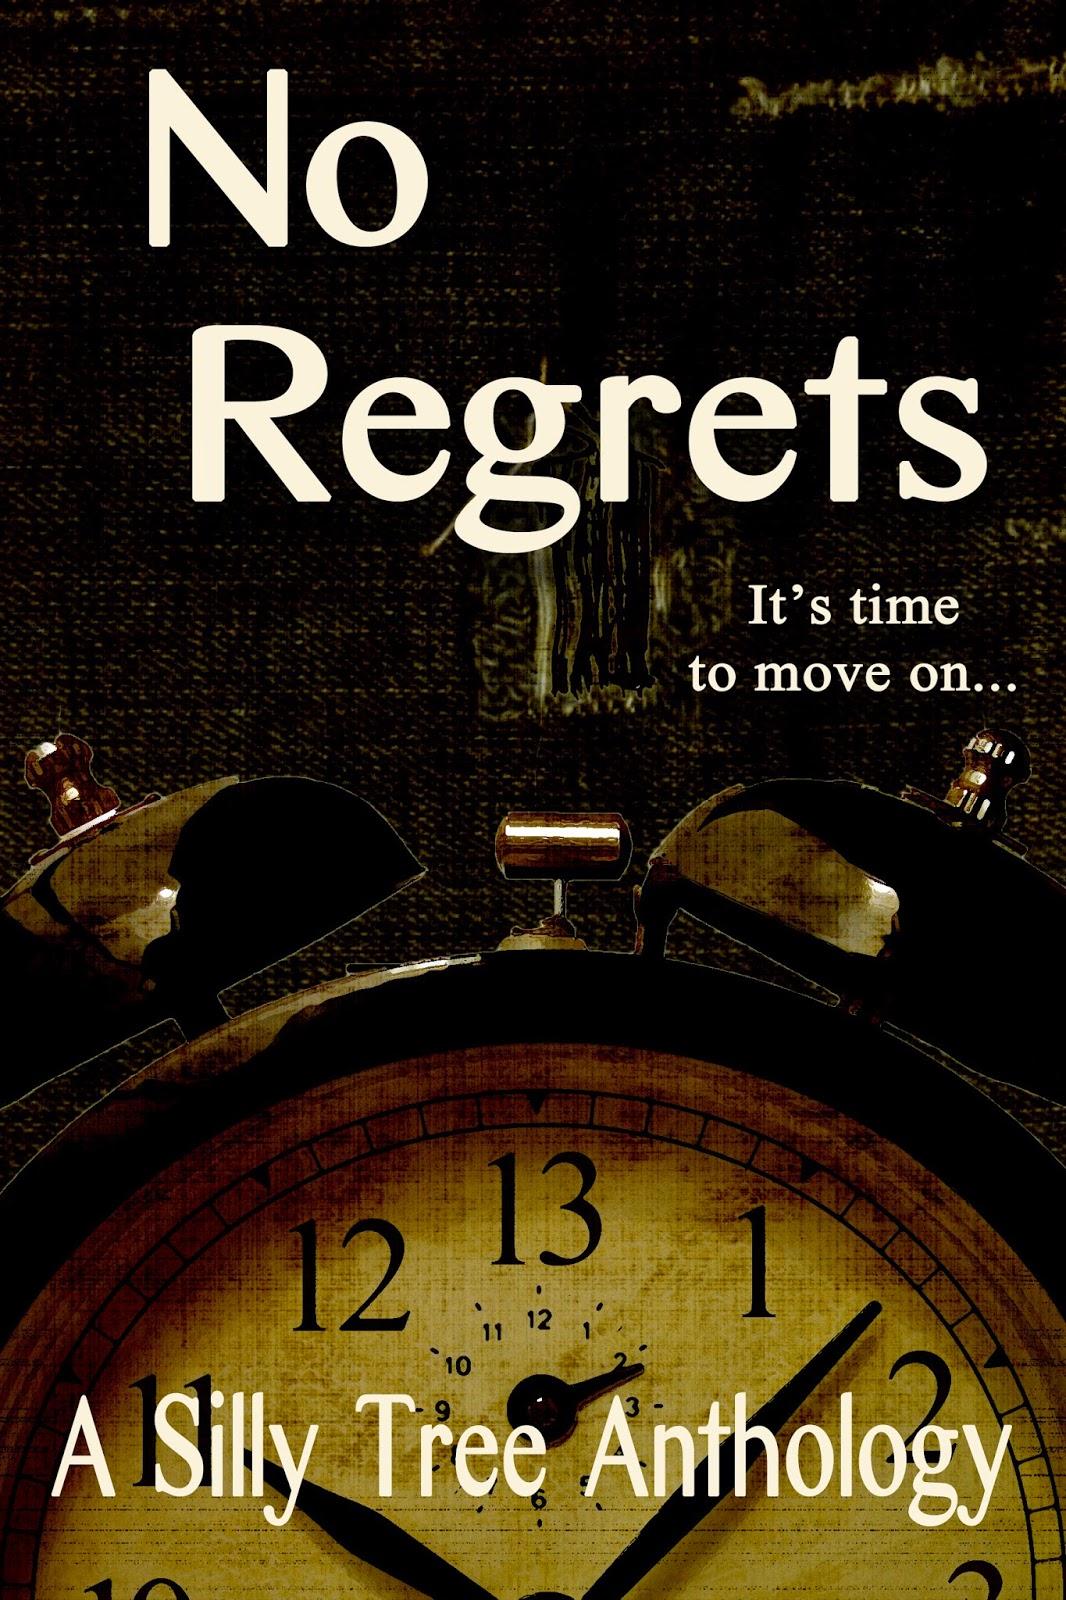 http://www.amazon.com/No-Regrets-Pamela-Gifford-ebook/dp/B00J5SE68A/ref=sr_1_1?s=books&ie=UTF8&qid=1403813820&sr=1-1&keywords=No+Regrets%2C+Silly+Tree